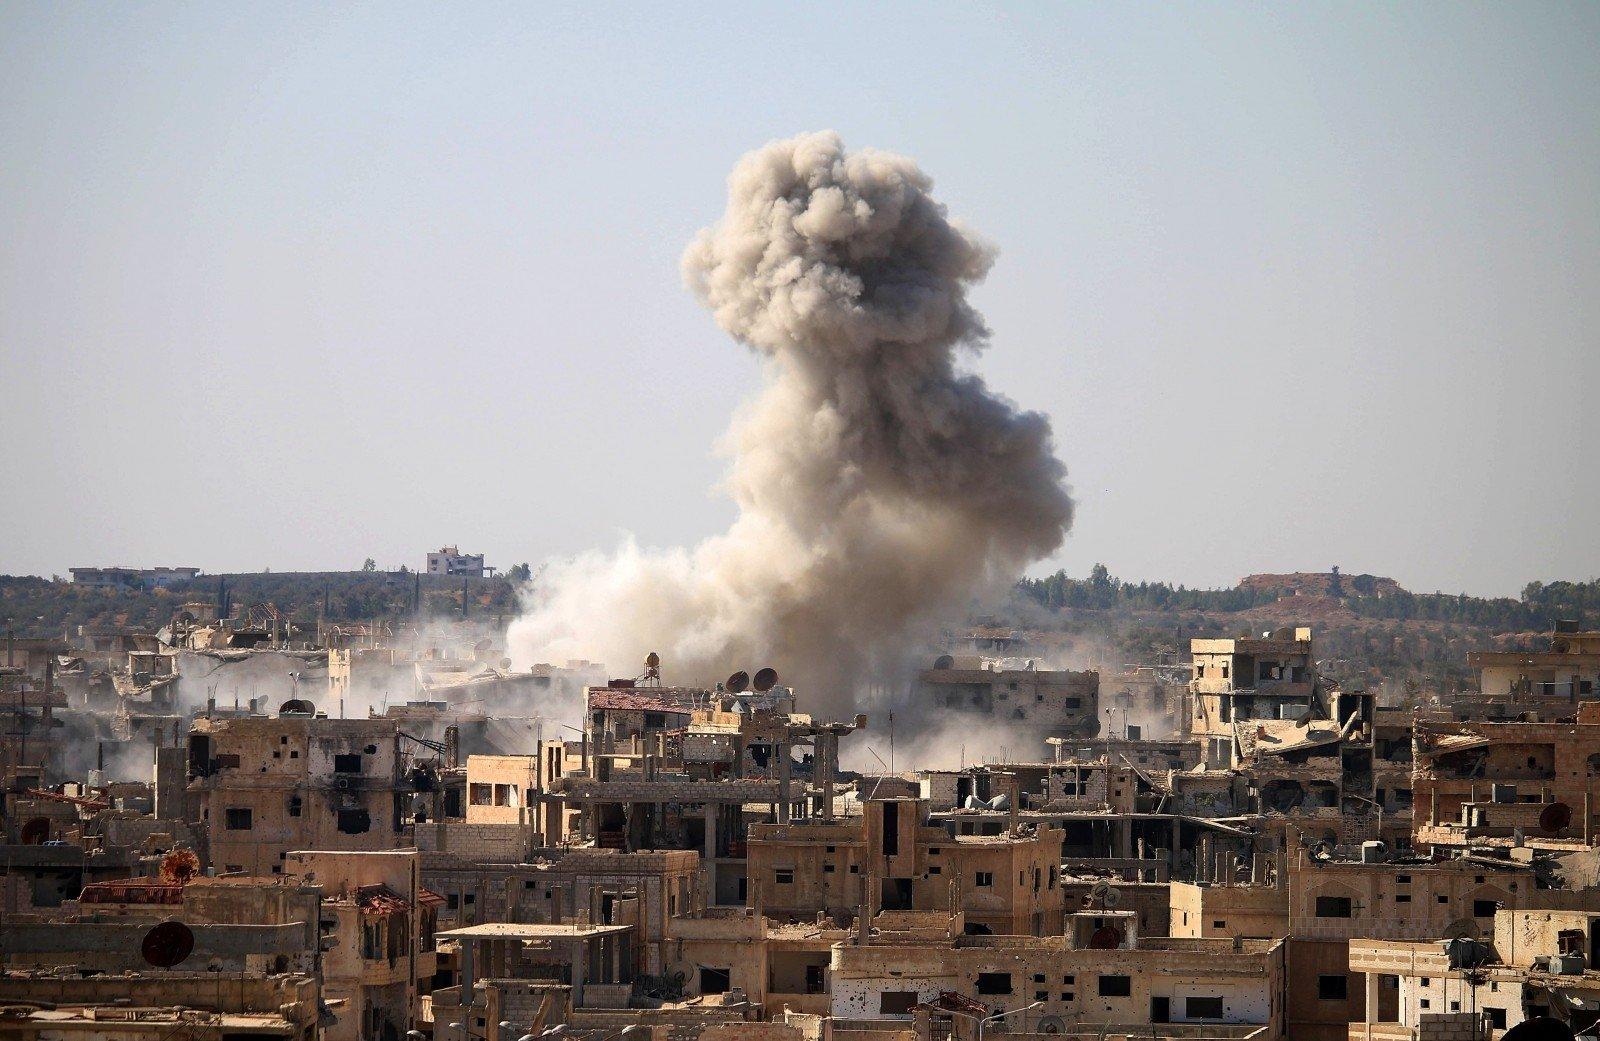 россия, сирия, игл, асад, аэродром, терроризм, атака, дейр-эз-зор